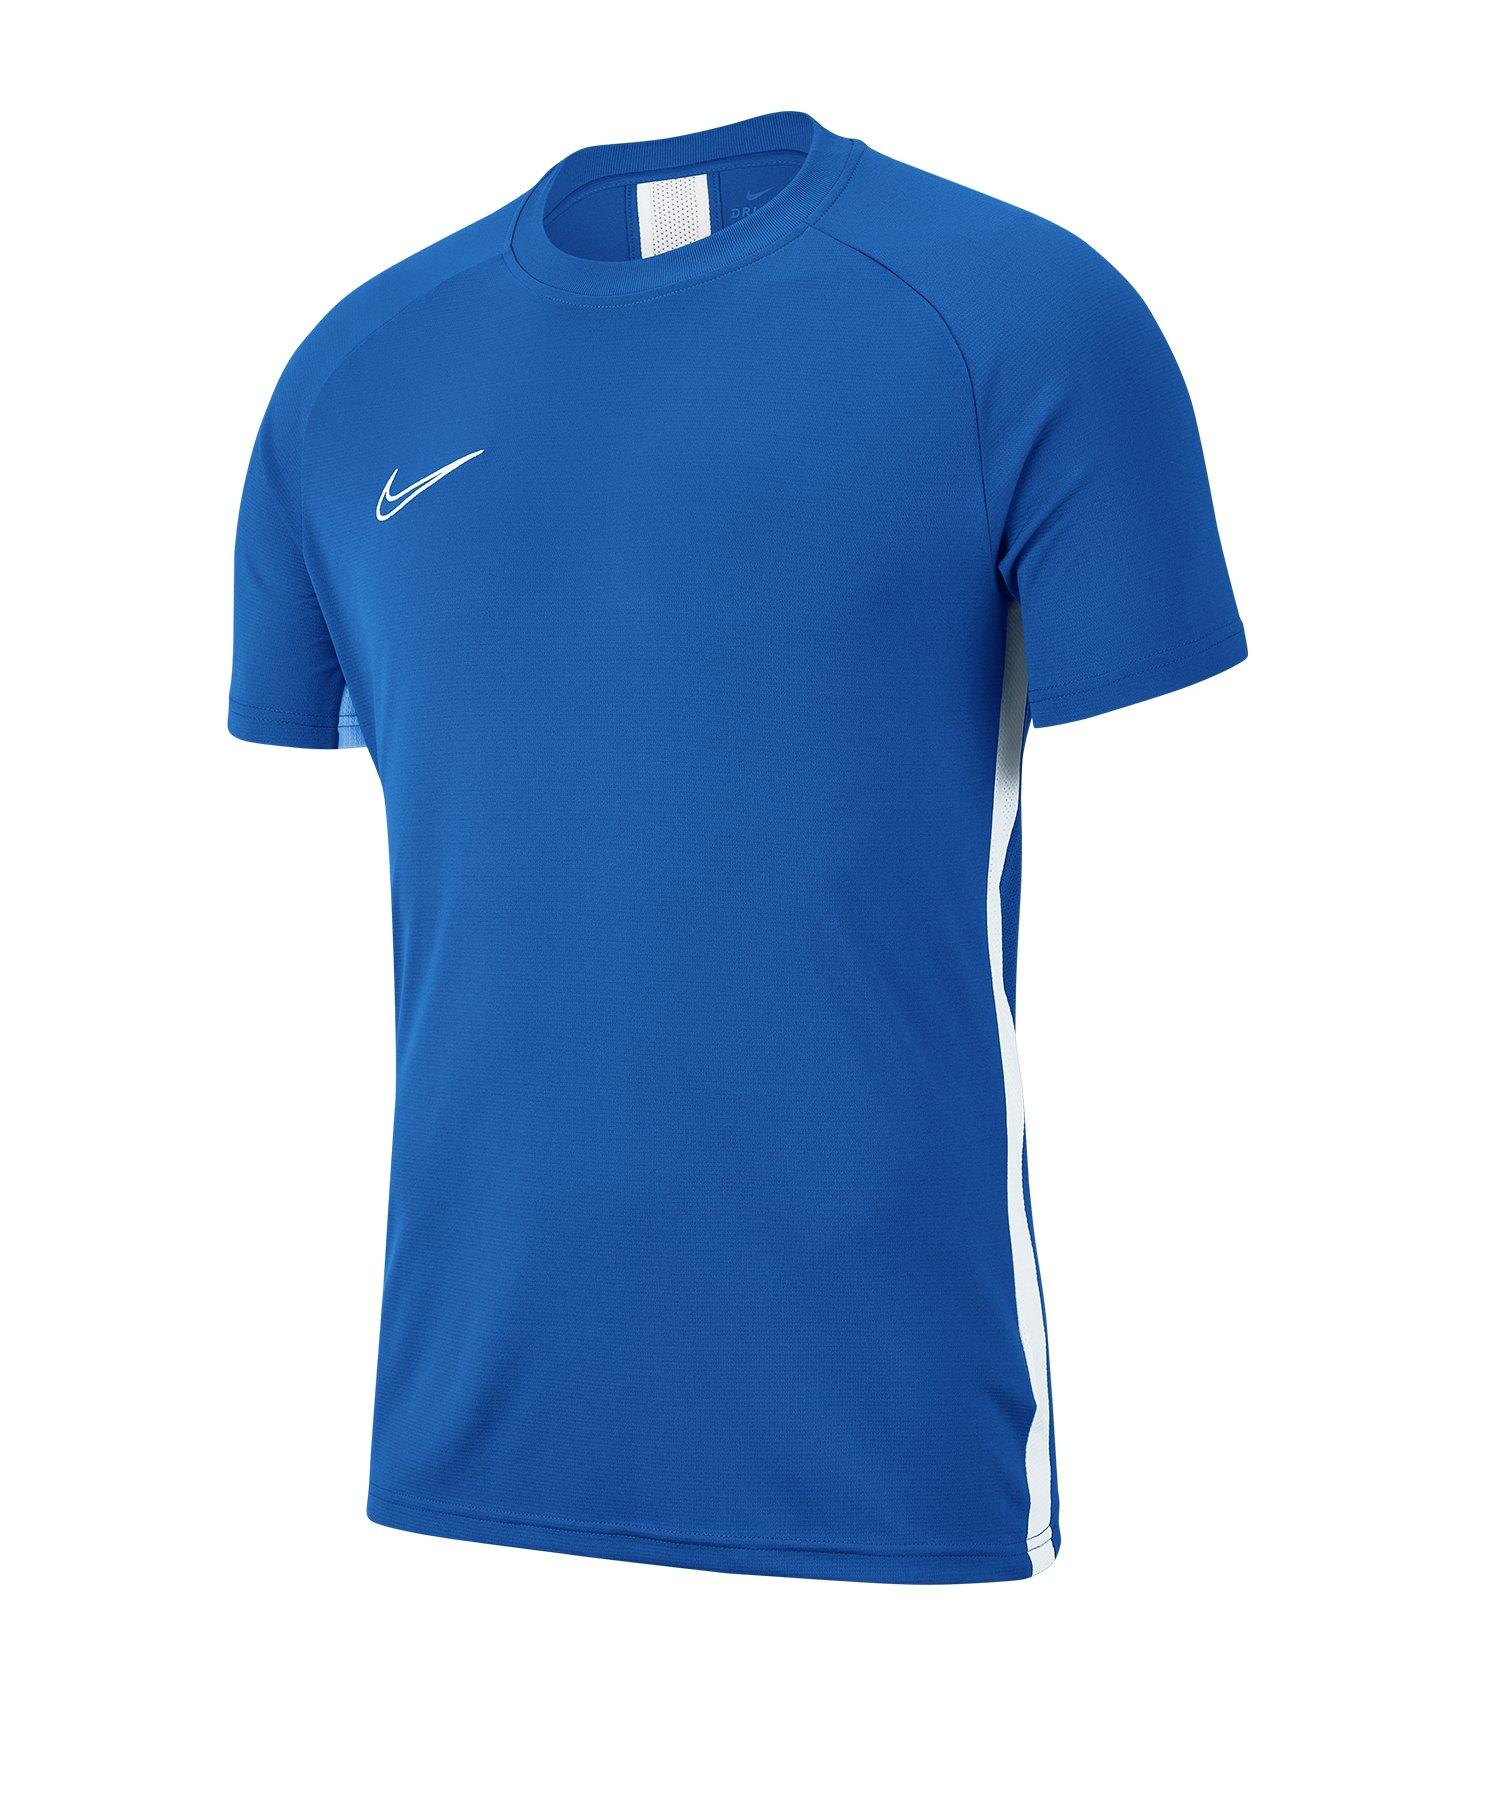 Nike Academy 19 Trainingstop T-Shirt Blau F463 - blau